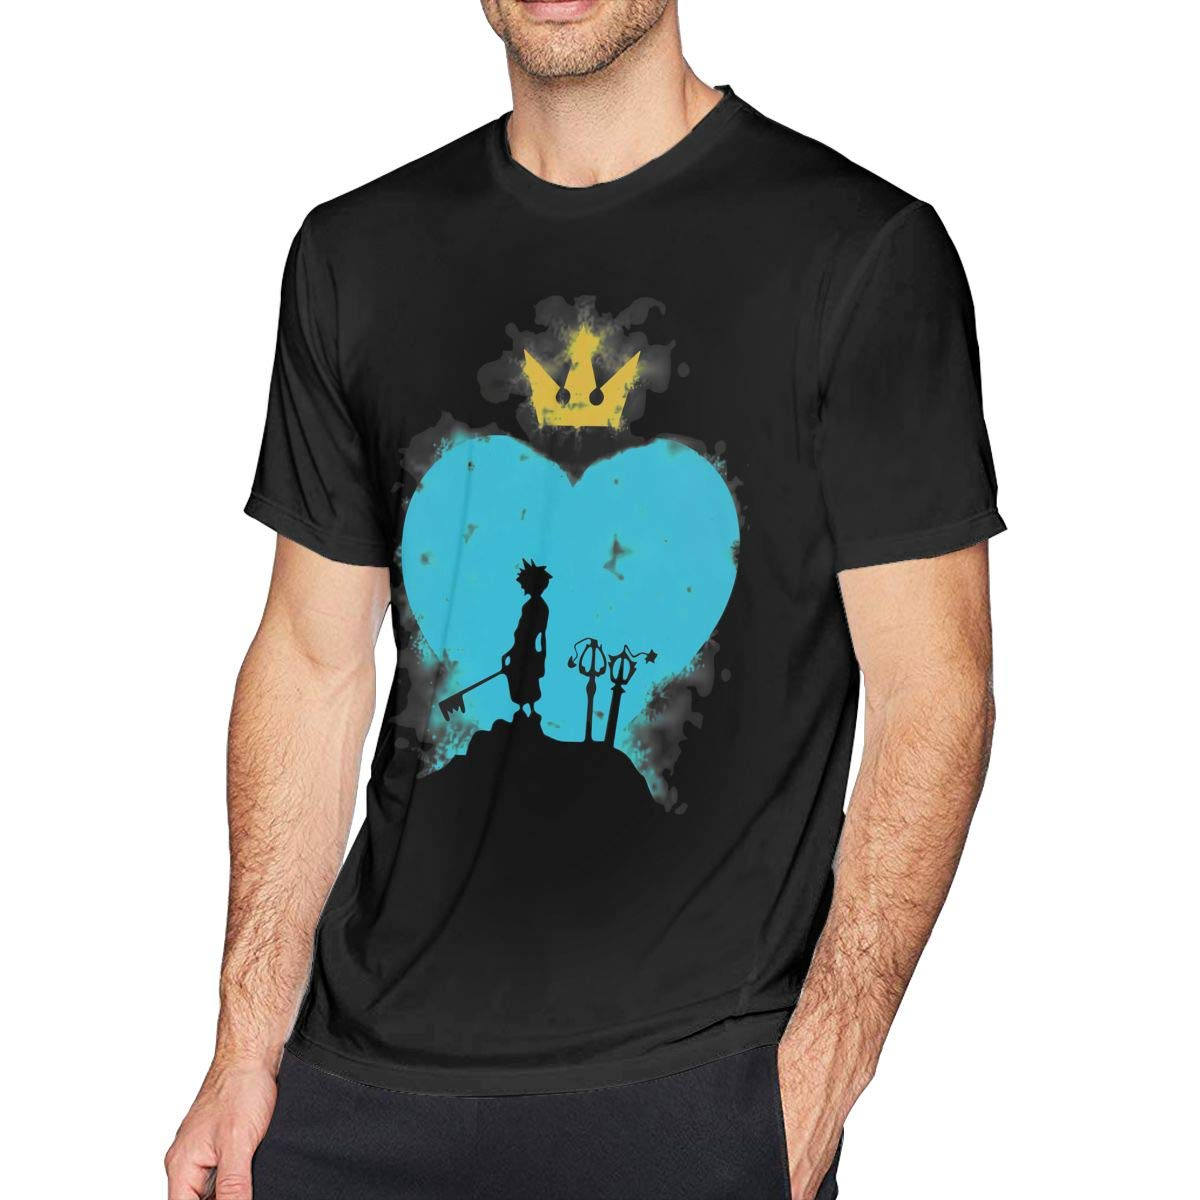 Hodenr S Vintage Kingdom Hearts T Shirt 6579